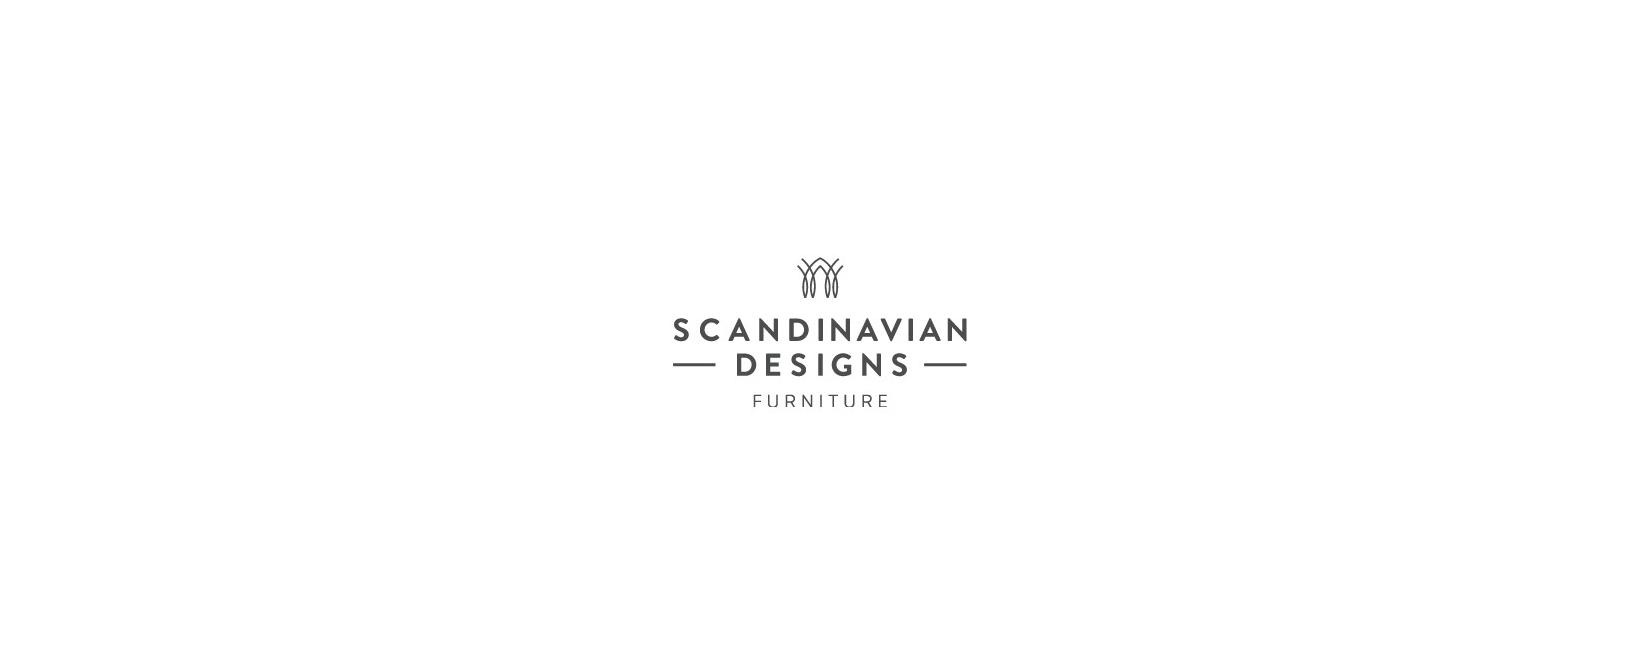 Scandinavian Designs Coupon Code 2021